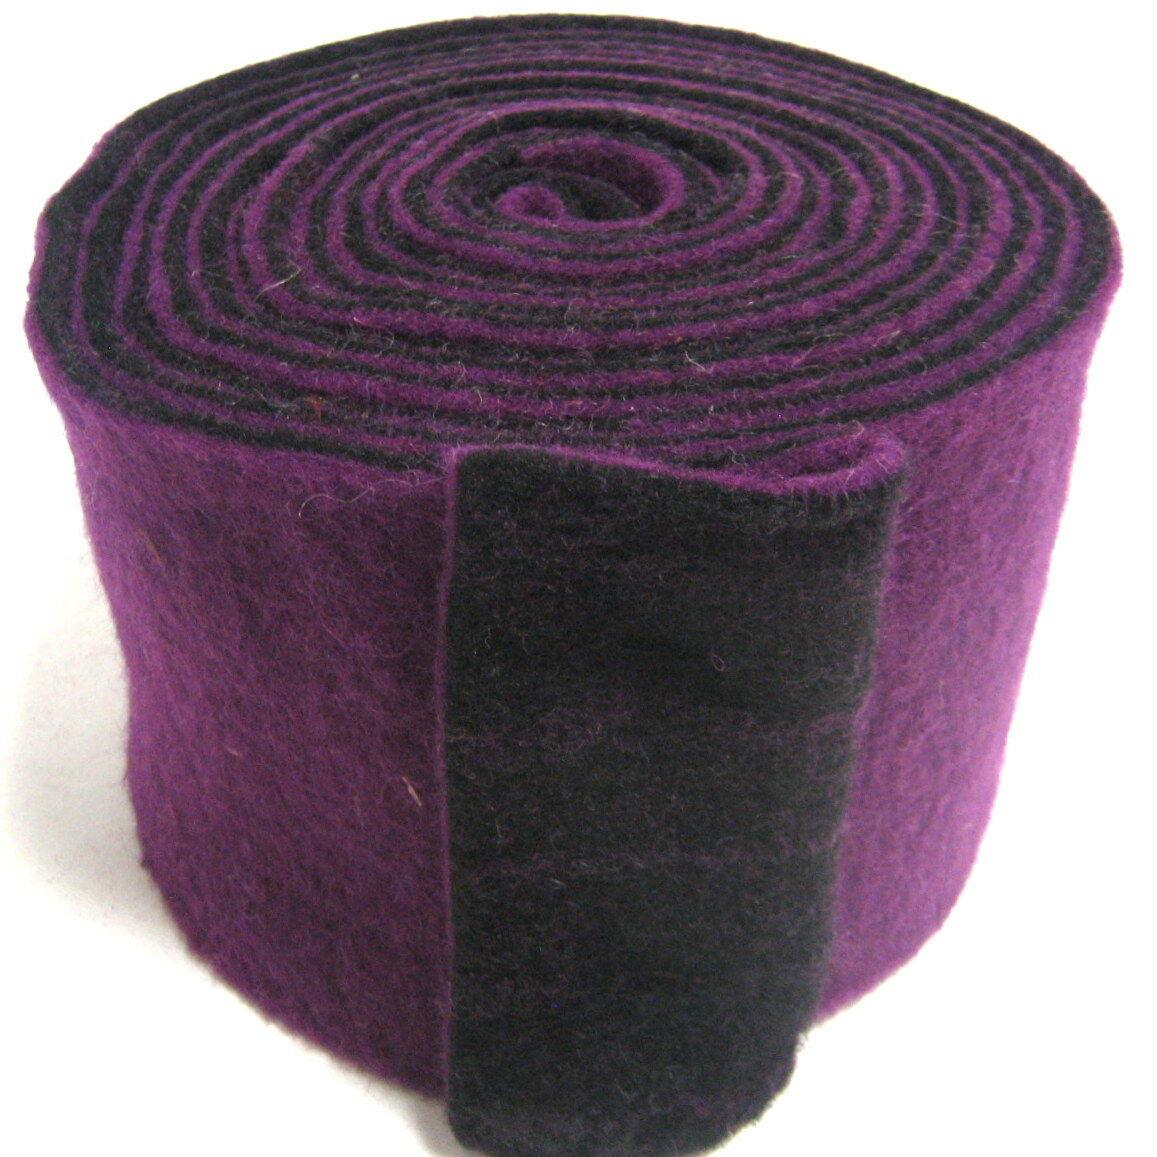 Topfband Filz 5 m x 15 cm zwei-farbige Dekoband Wollvlies Filz-Band Wollband  - brombeer-schwarz